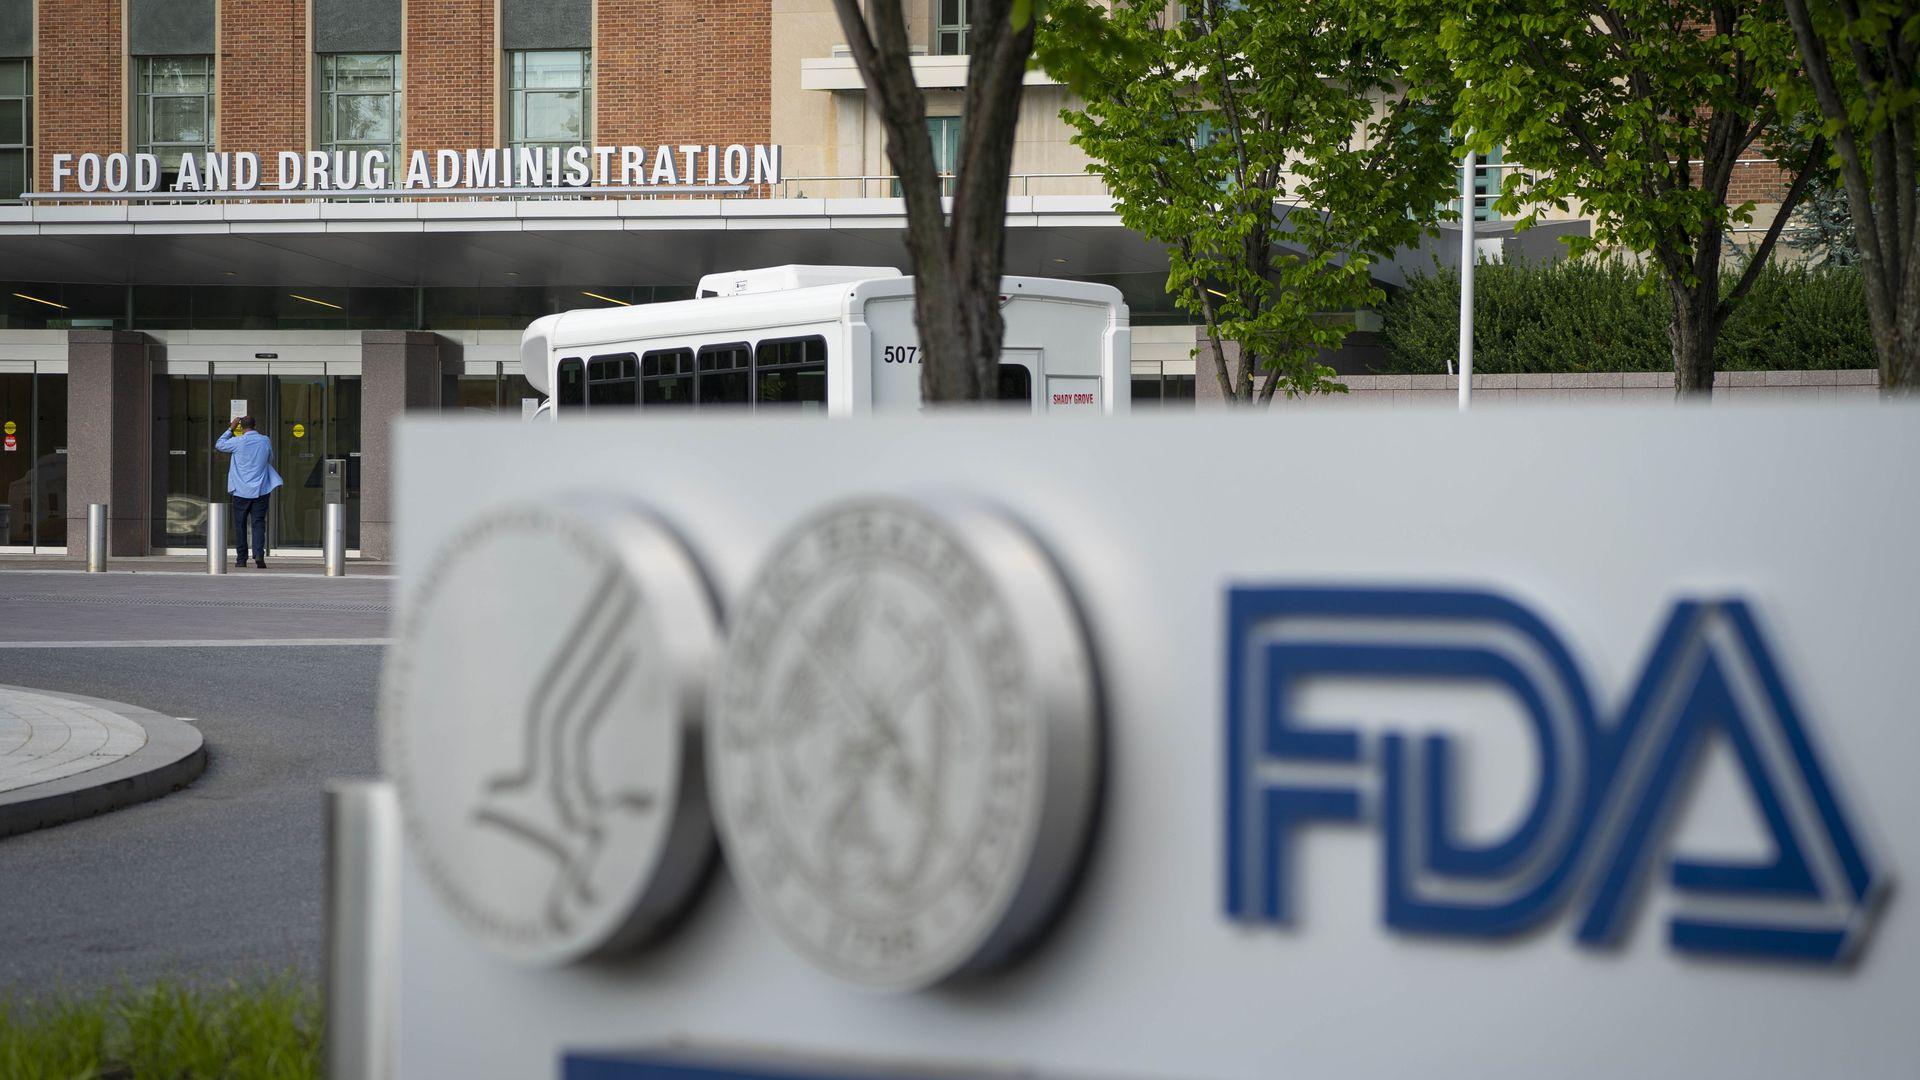 FDA批准了一种新款的减肥药Wegovy